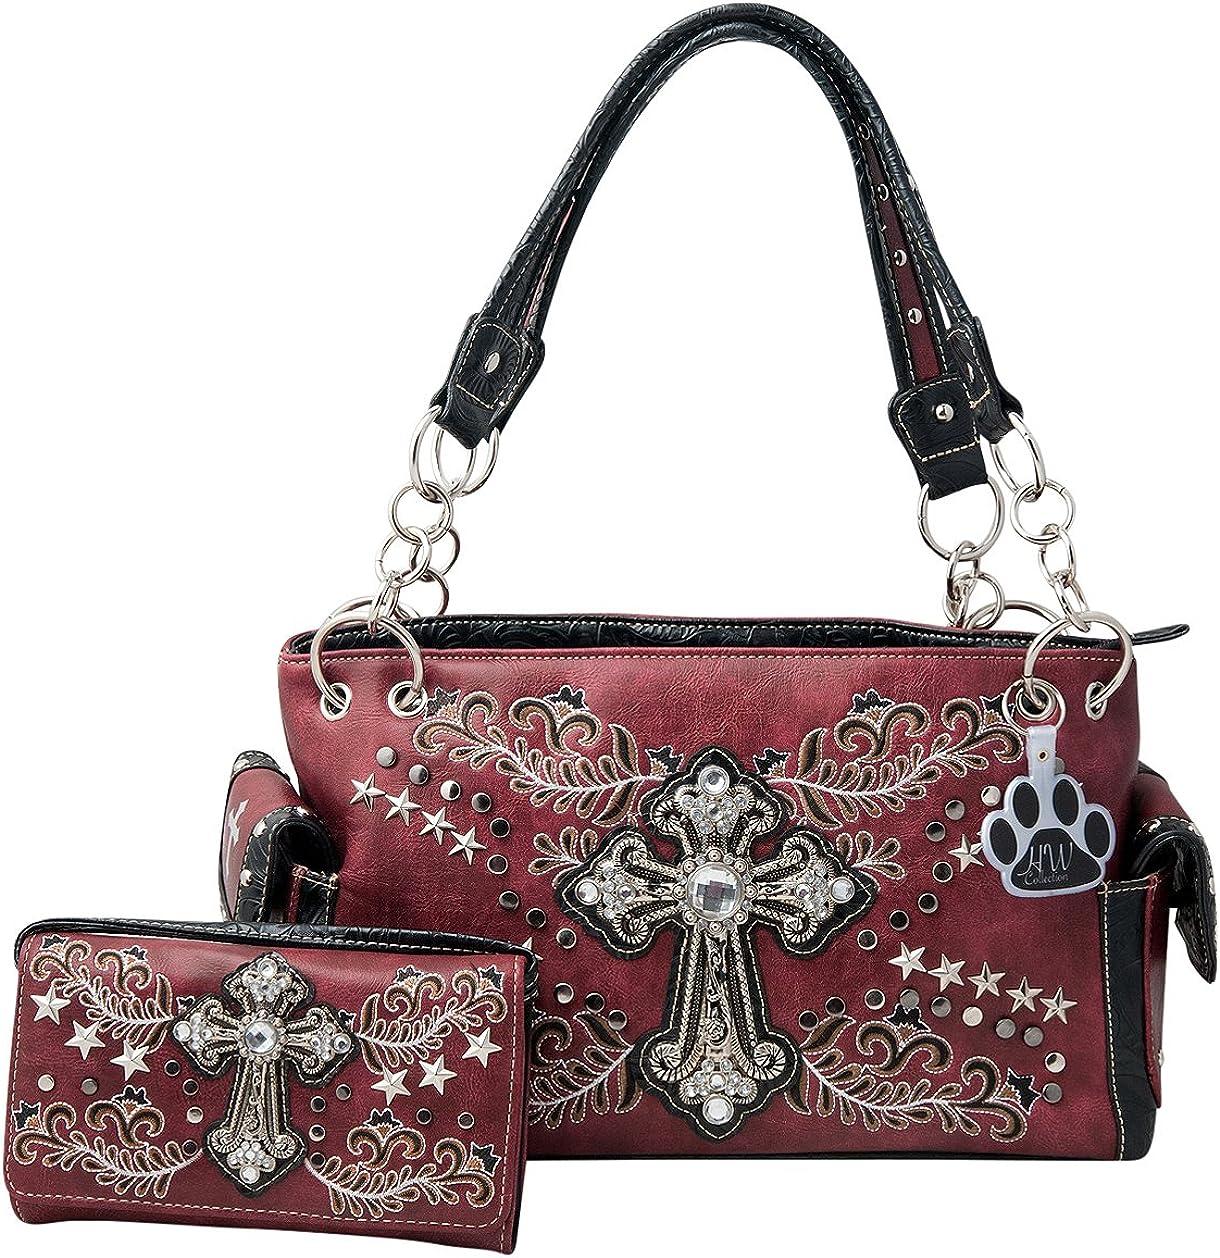 HW Collection Western Purse Rhinestone Cross Leaf Vine Concealed Carry Handbag and Wallet Set